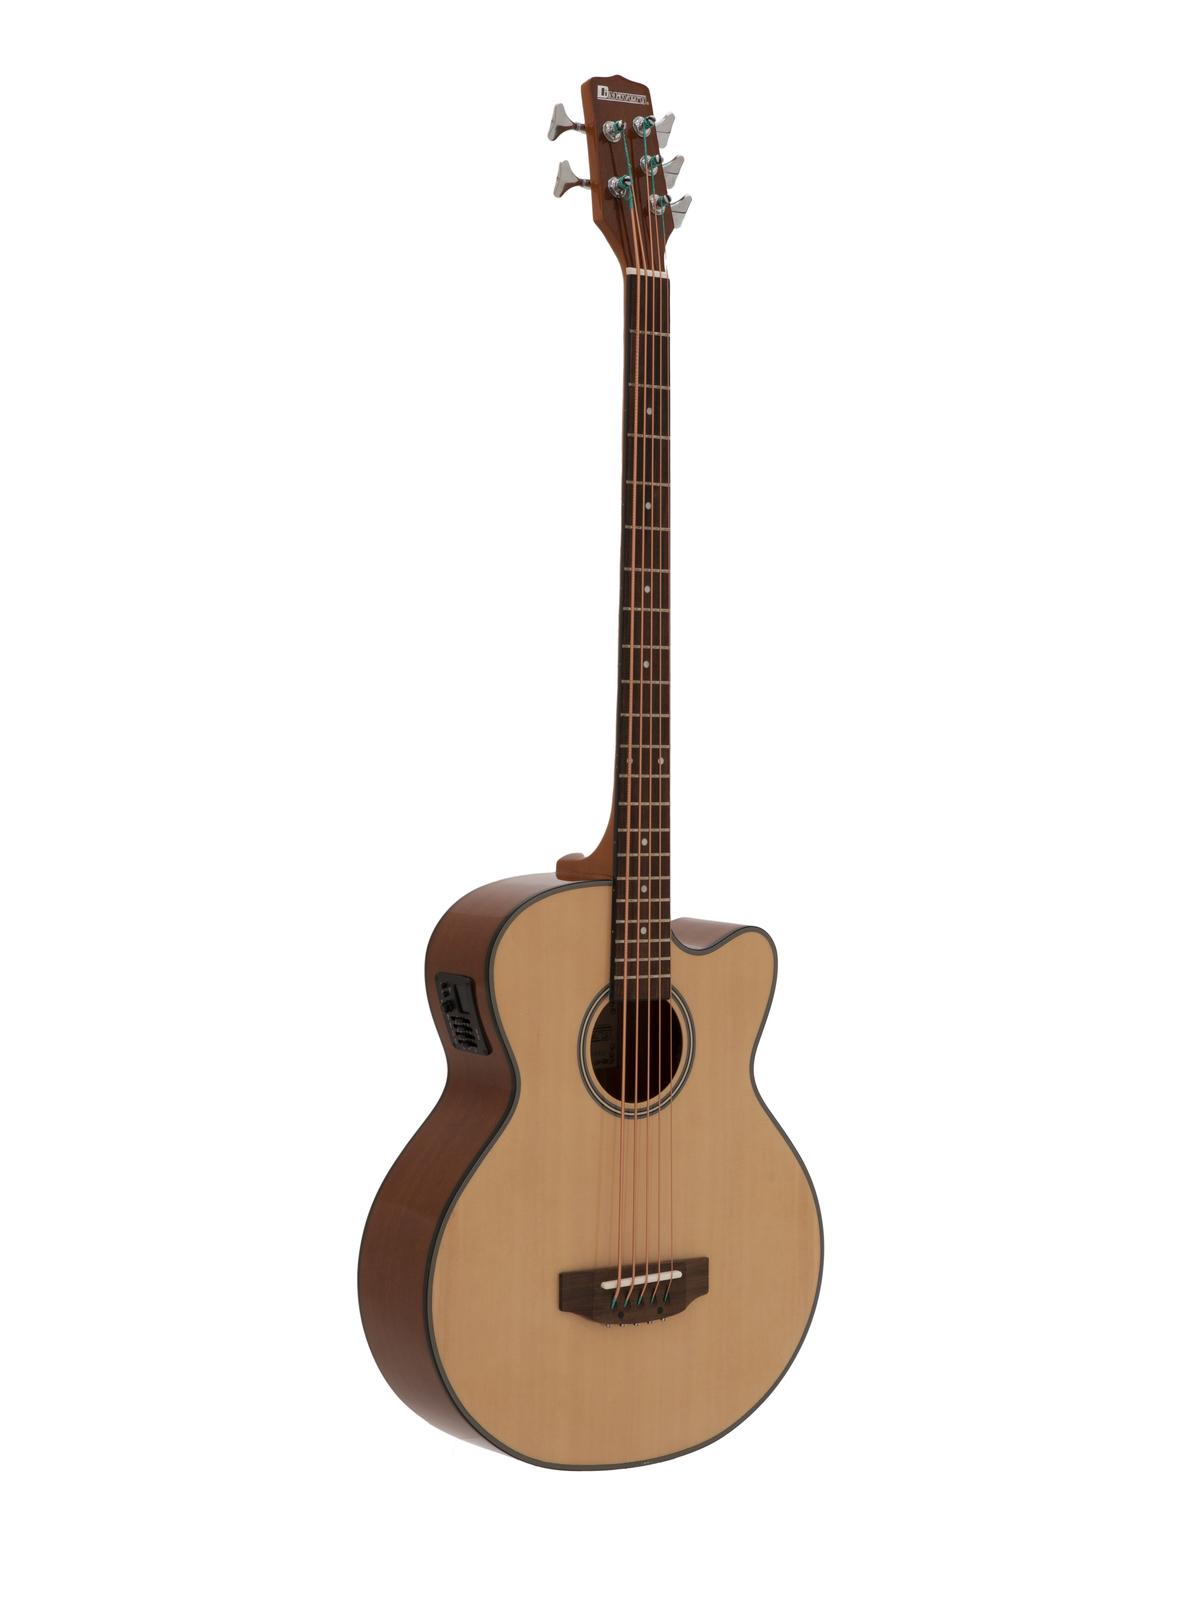 DIMAVERY AB-455 Akustikbass, 5-saitig, natur